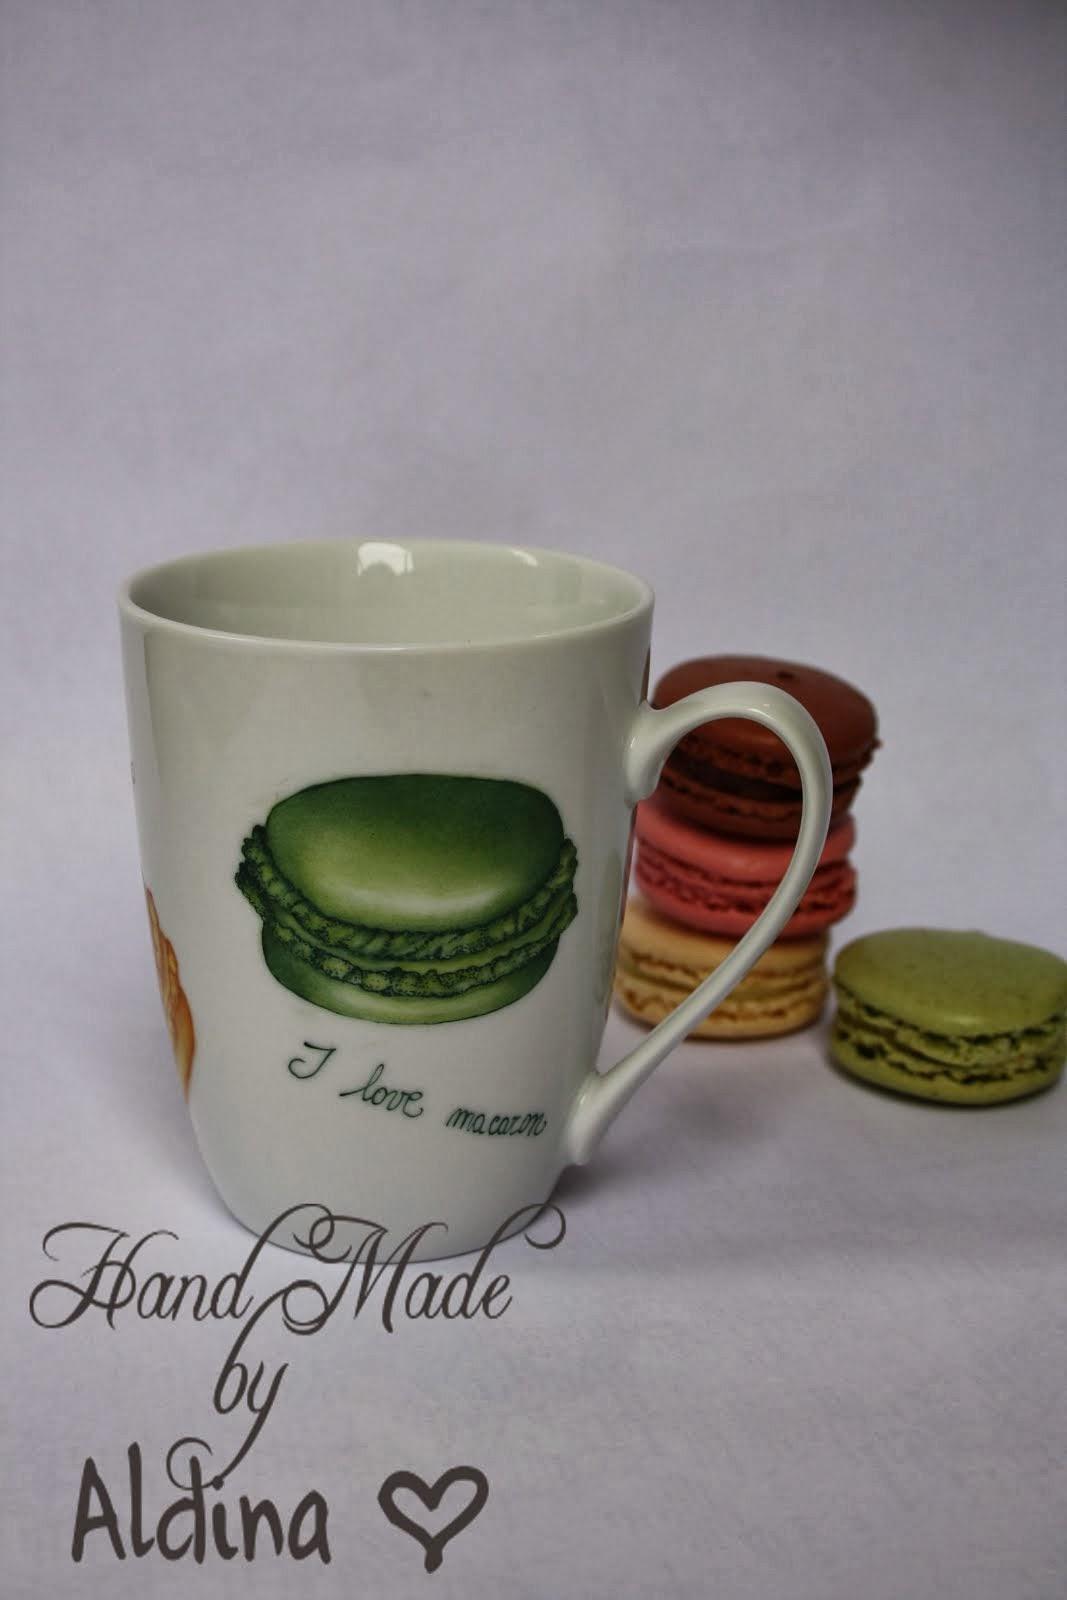 Macaron's cup